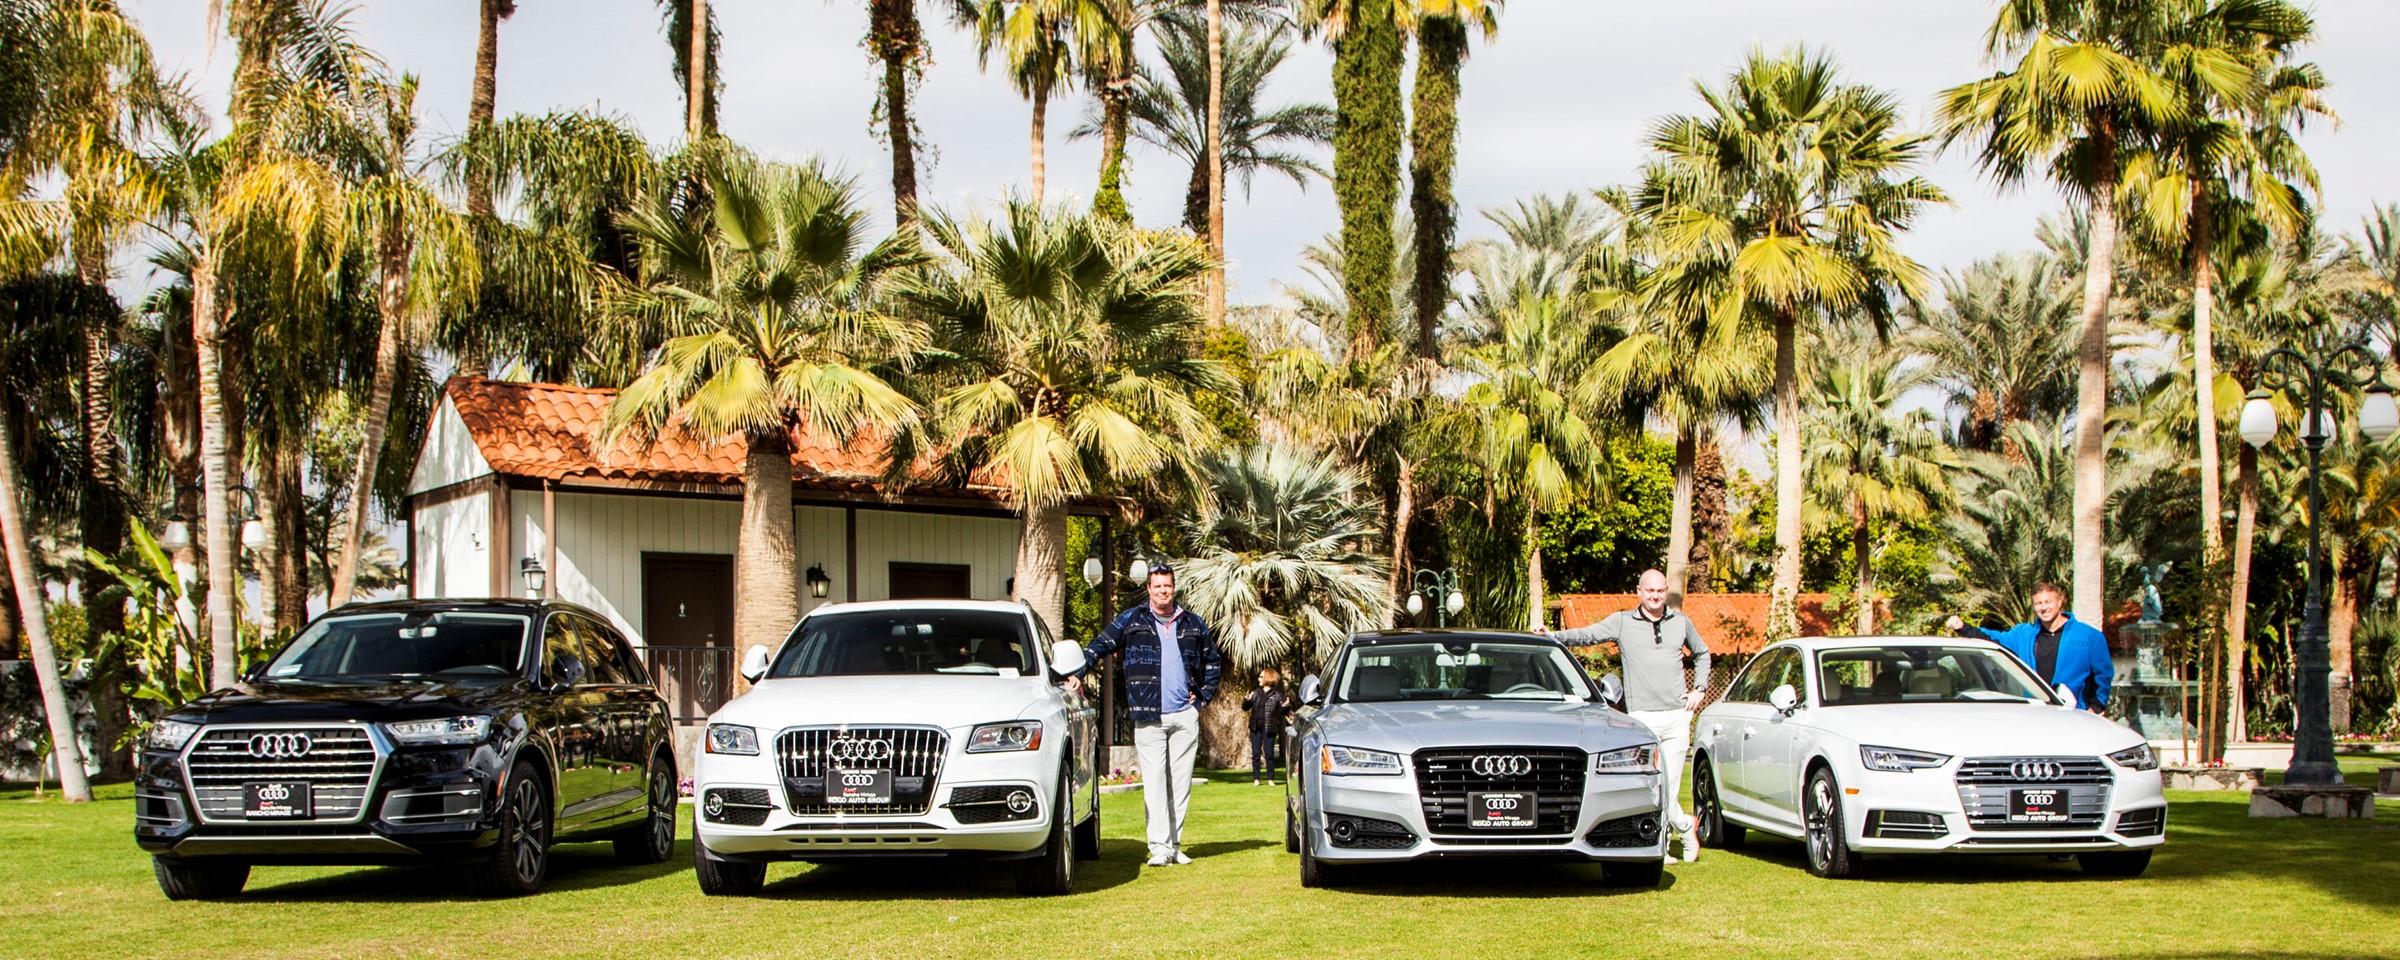 Club Car Dealer In Palm Springs